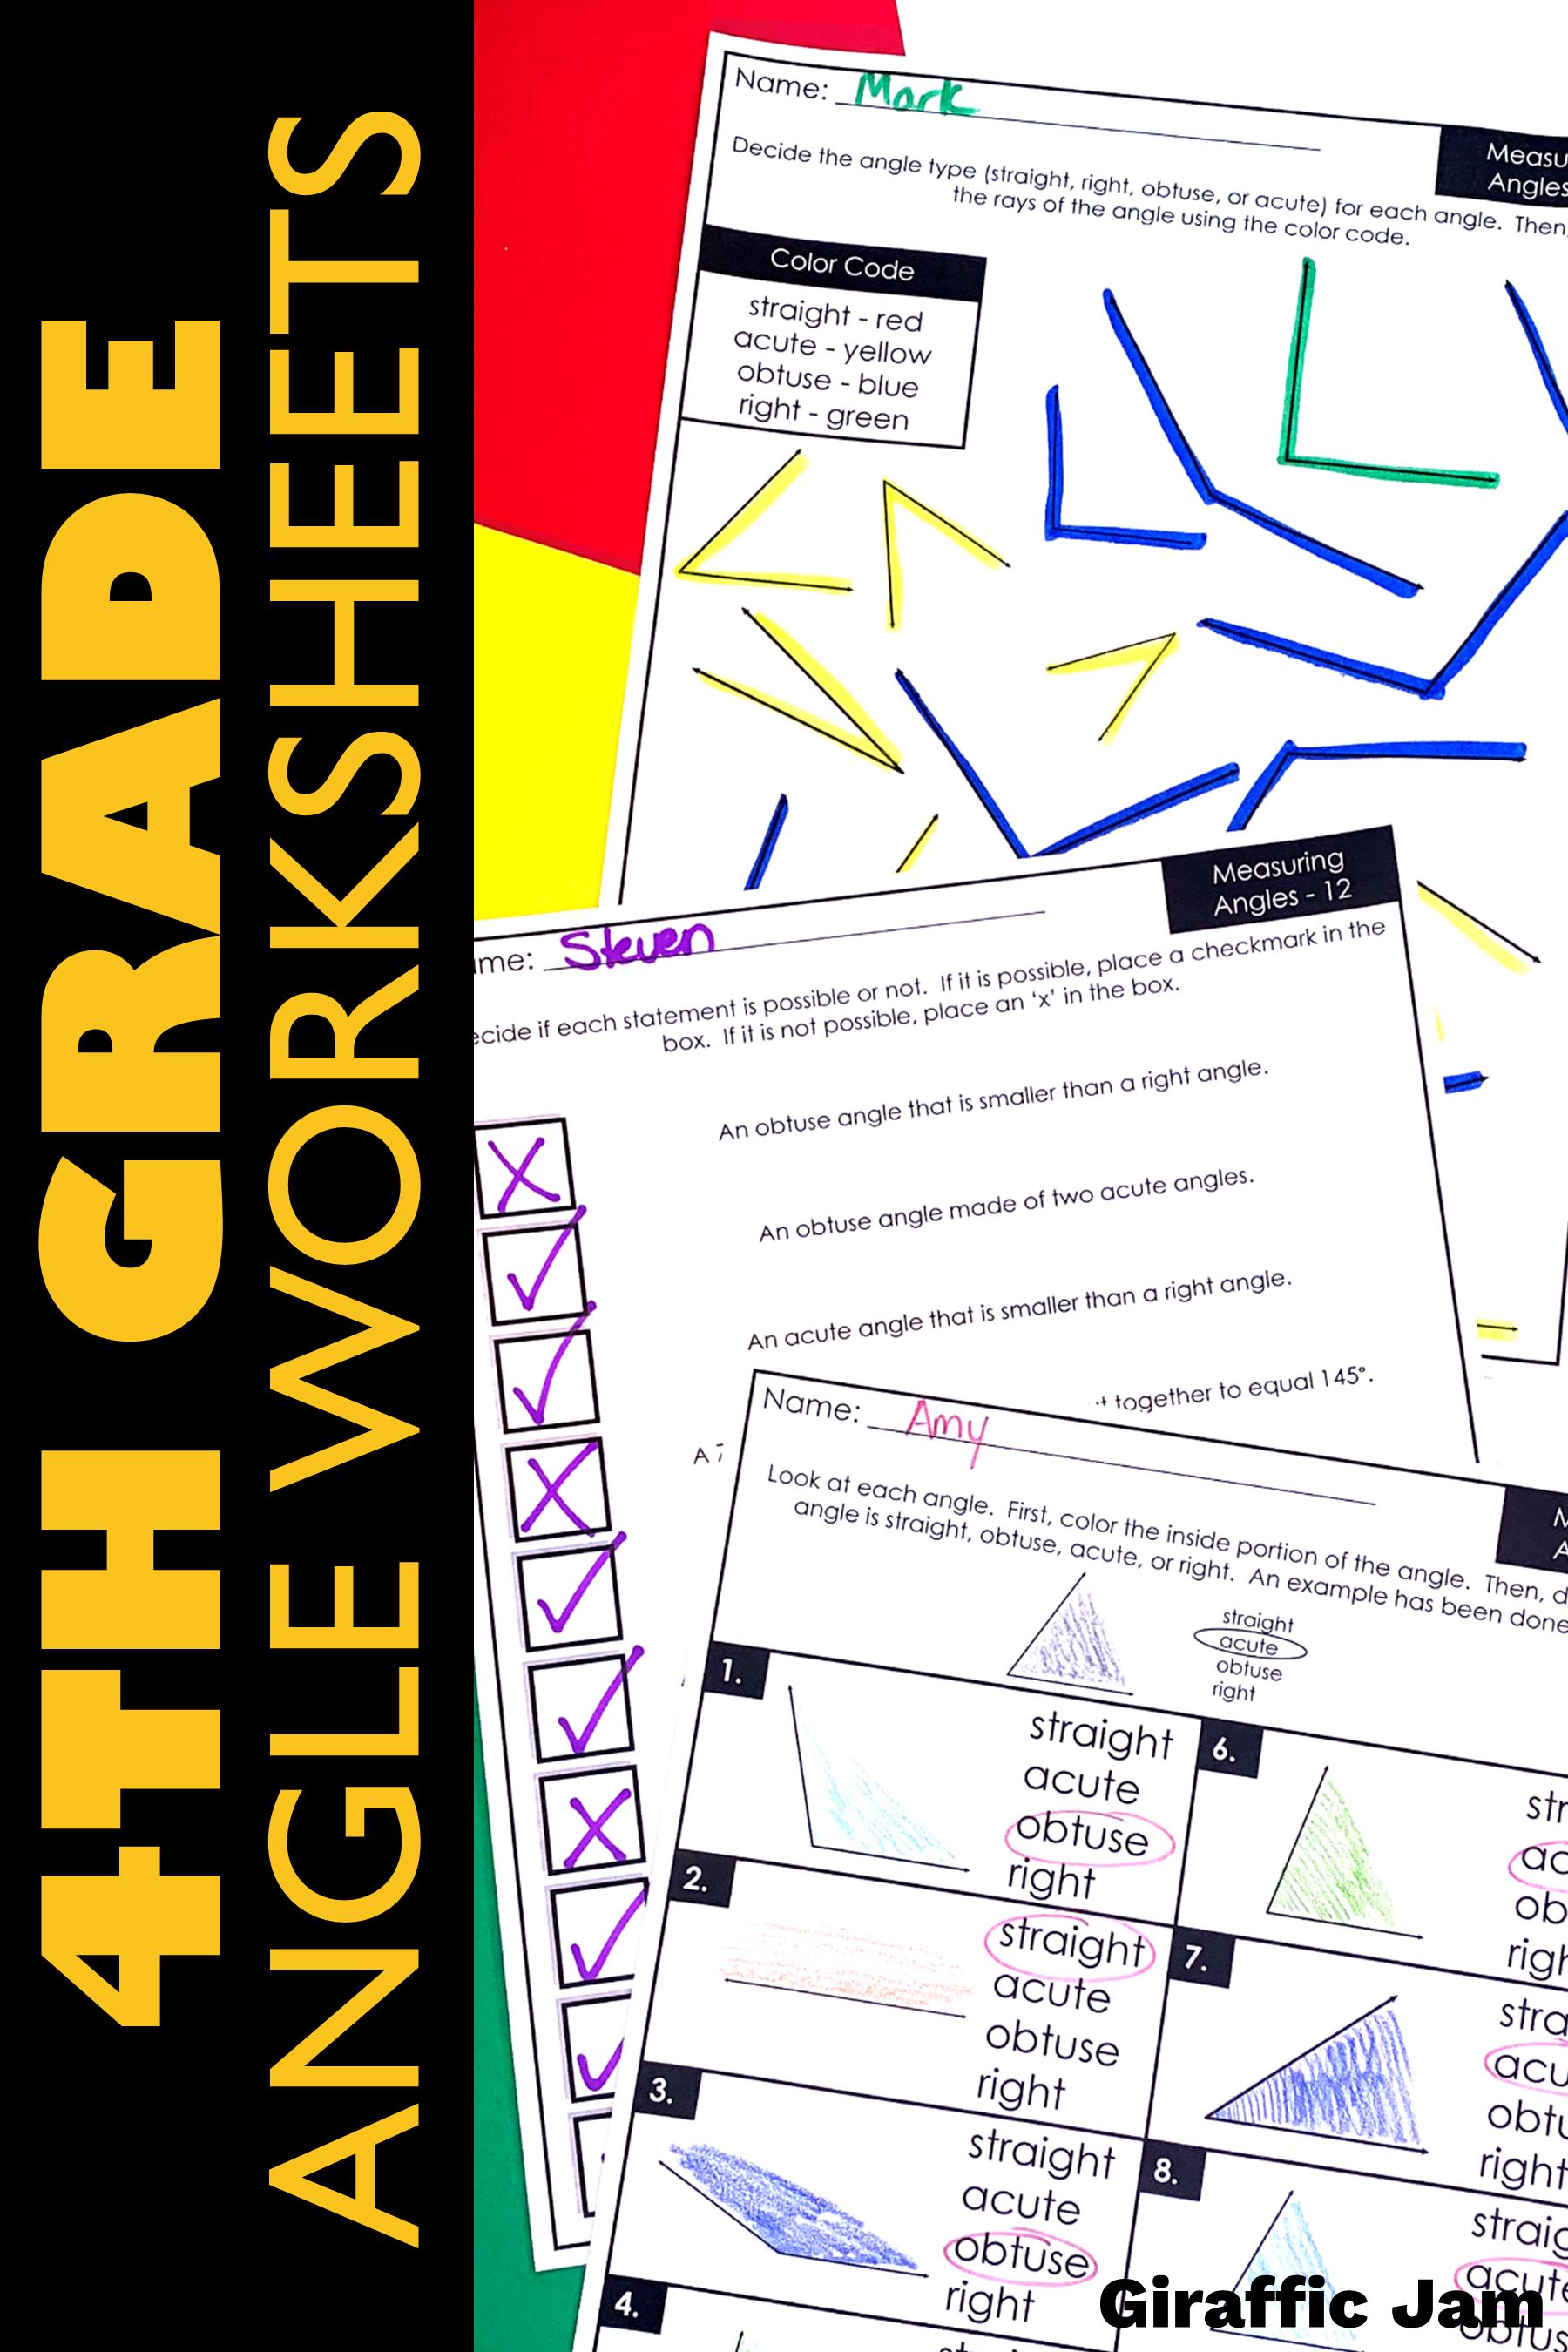 4th Grade Angle Measurement Worksheets With Digital Google Slides Version Google Classroom Activities Measurement Worksheets Teaching Measurement [ 2700 x 1800 Pixel ]